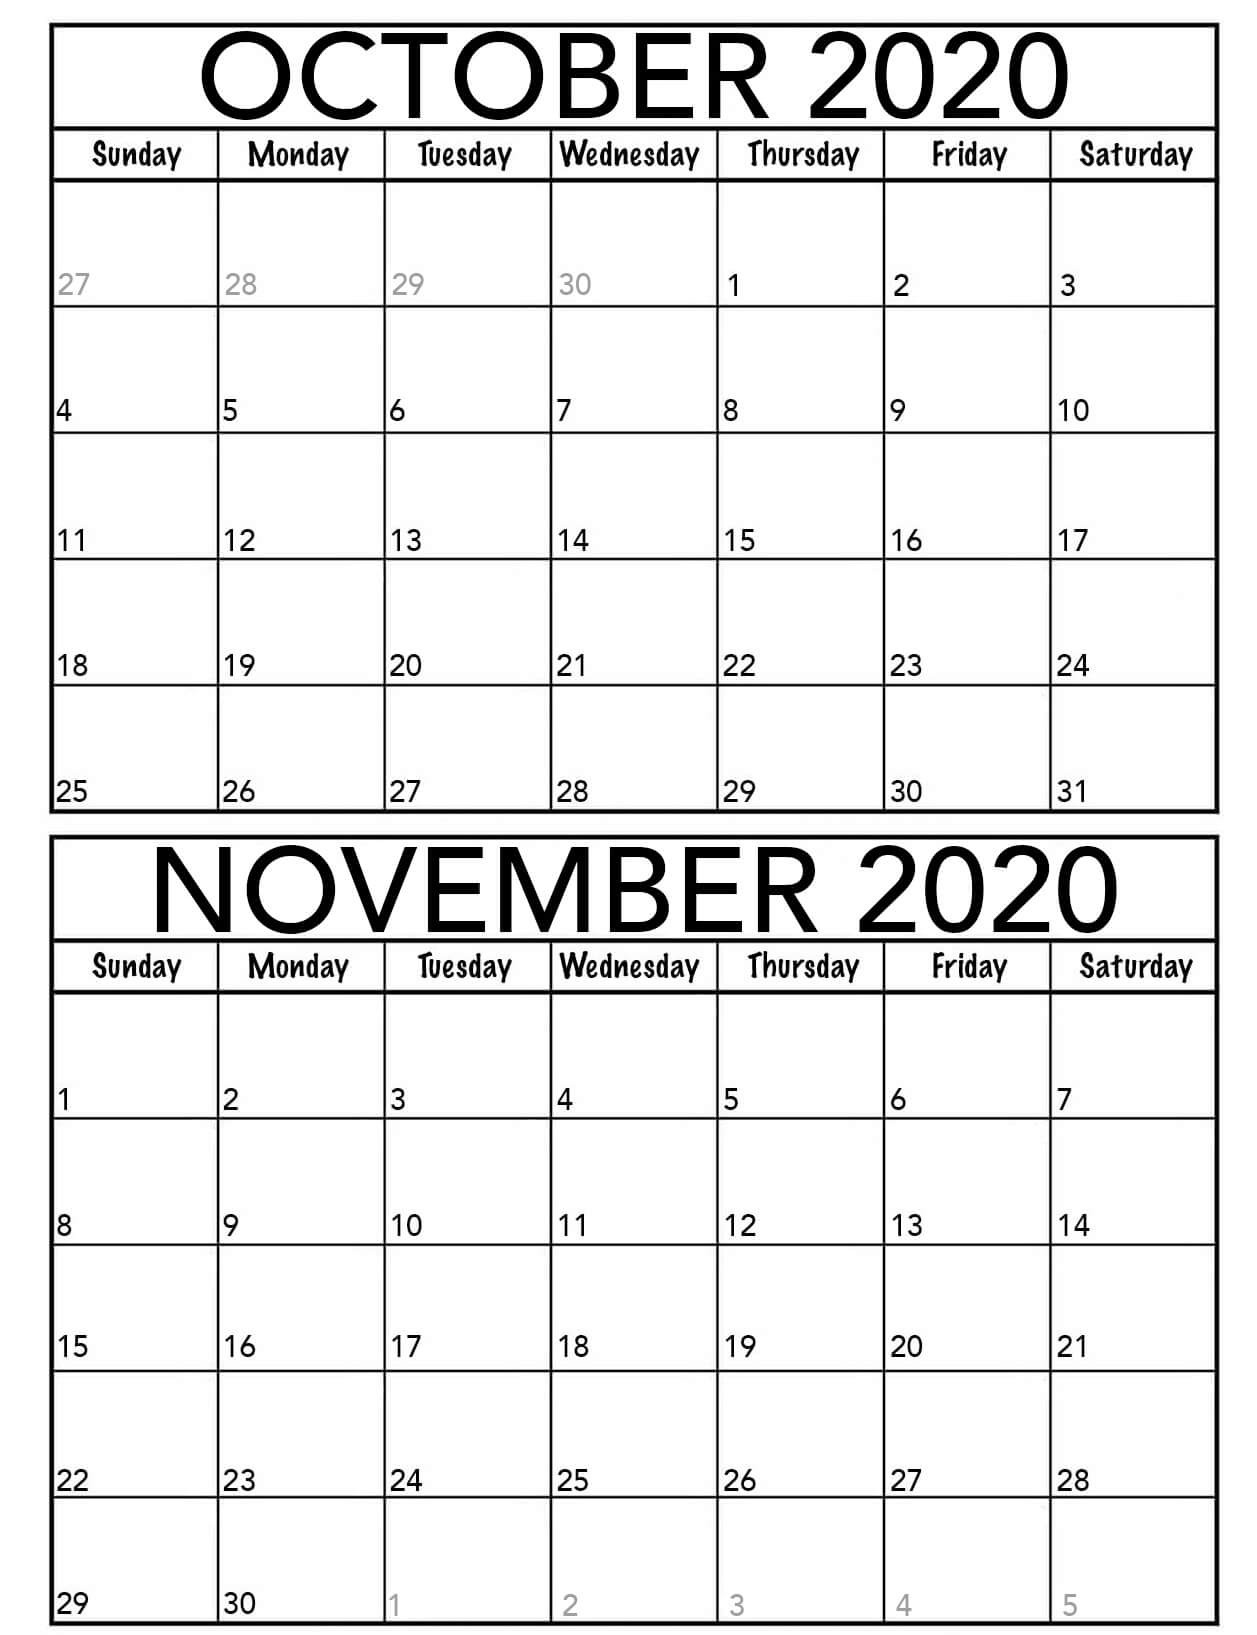 Blank Fill In Calendars 2021 Printable | Calendar-Fill In Calendar January 2021